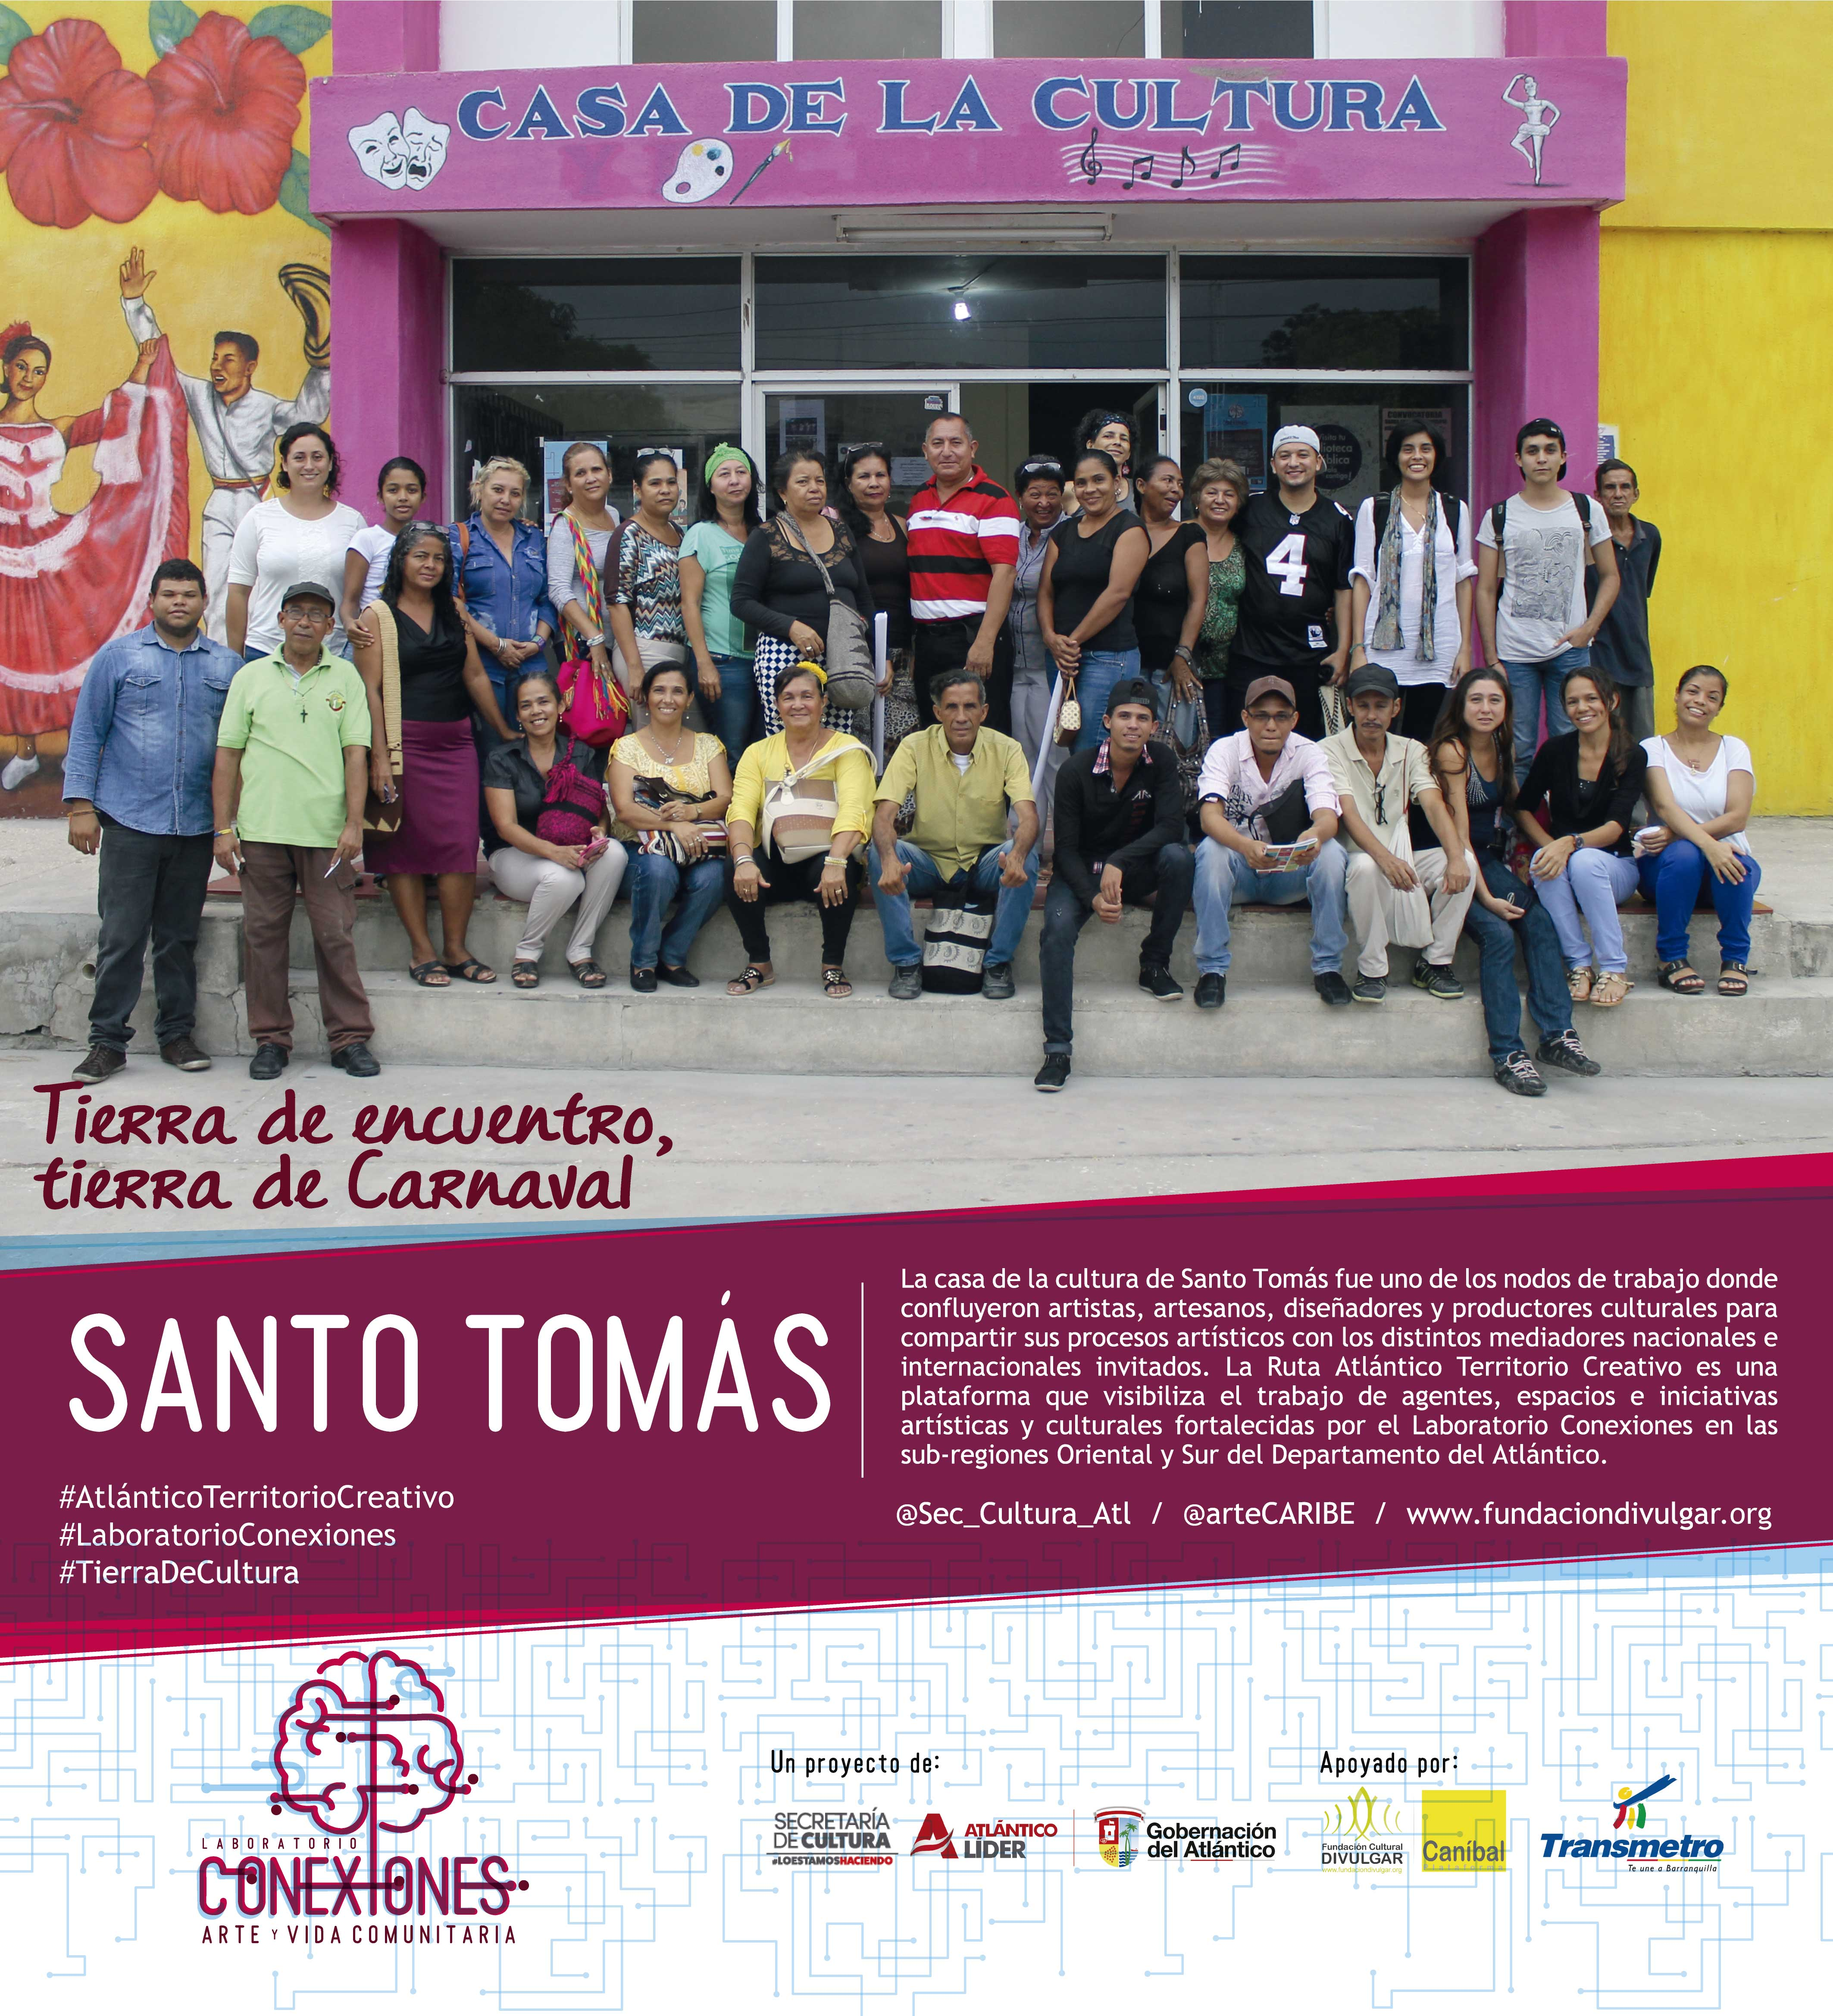 SantoTomas